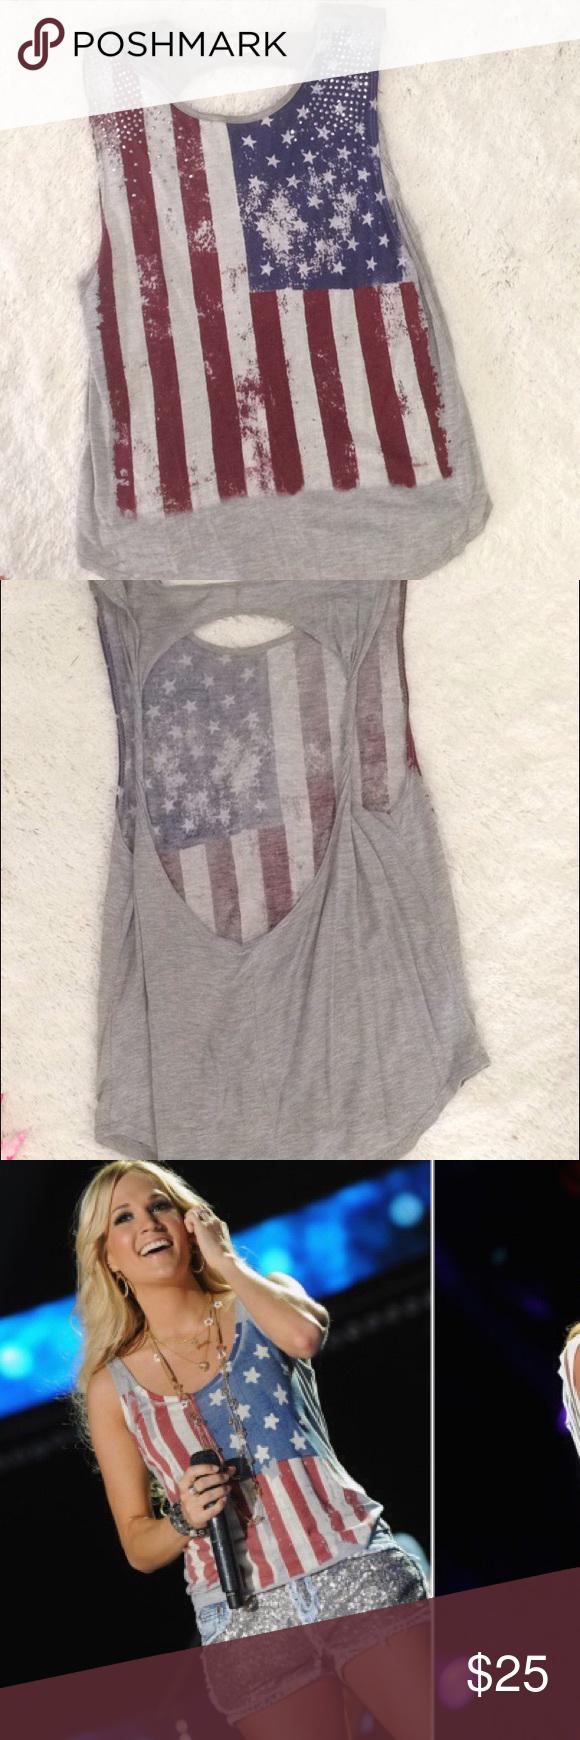 American Flag Shirt American Flag Shirt Clothes Design Fashion